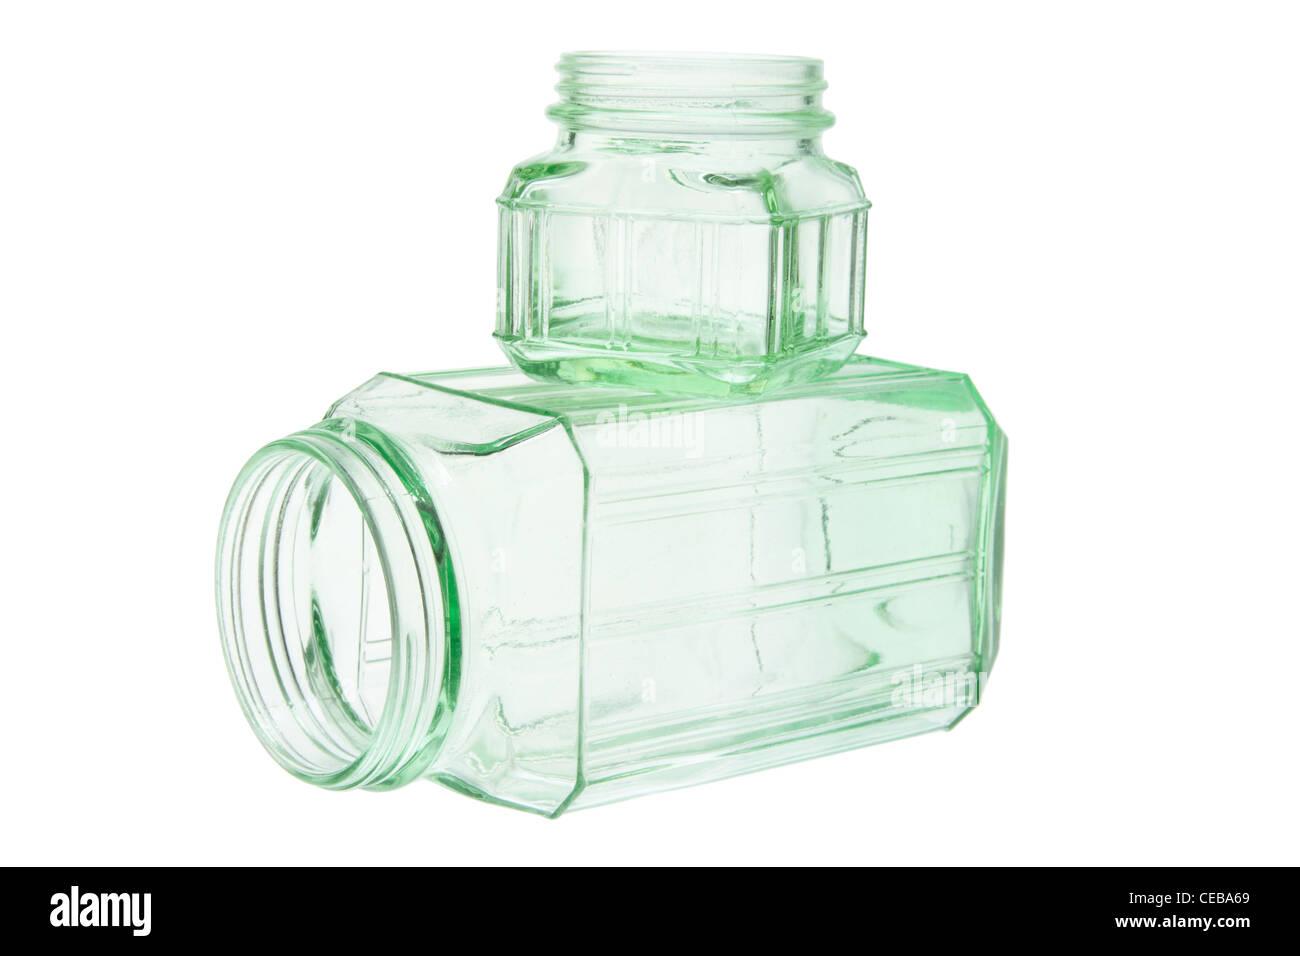 Glass Jars - Stock Image